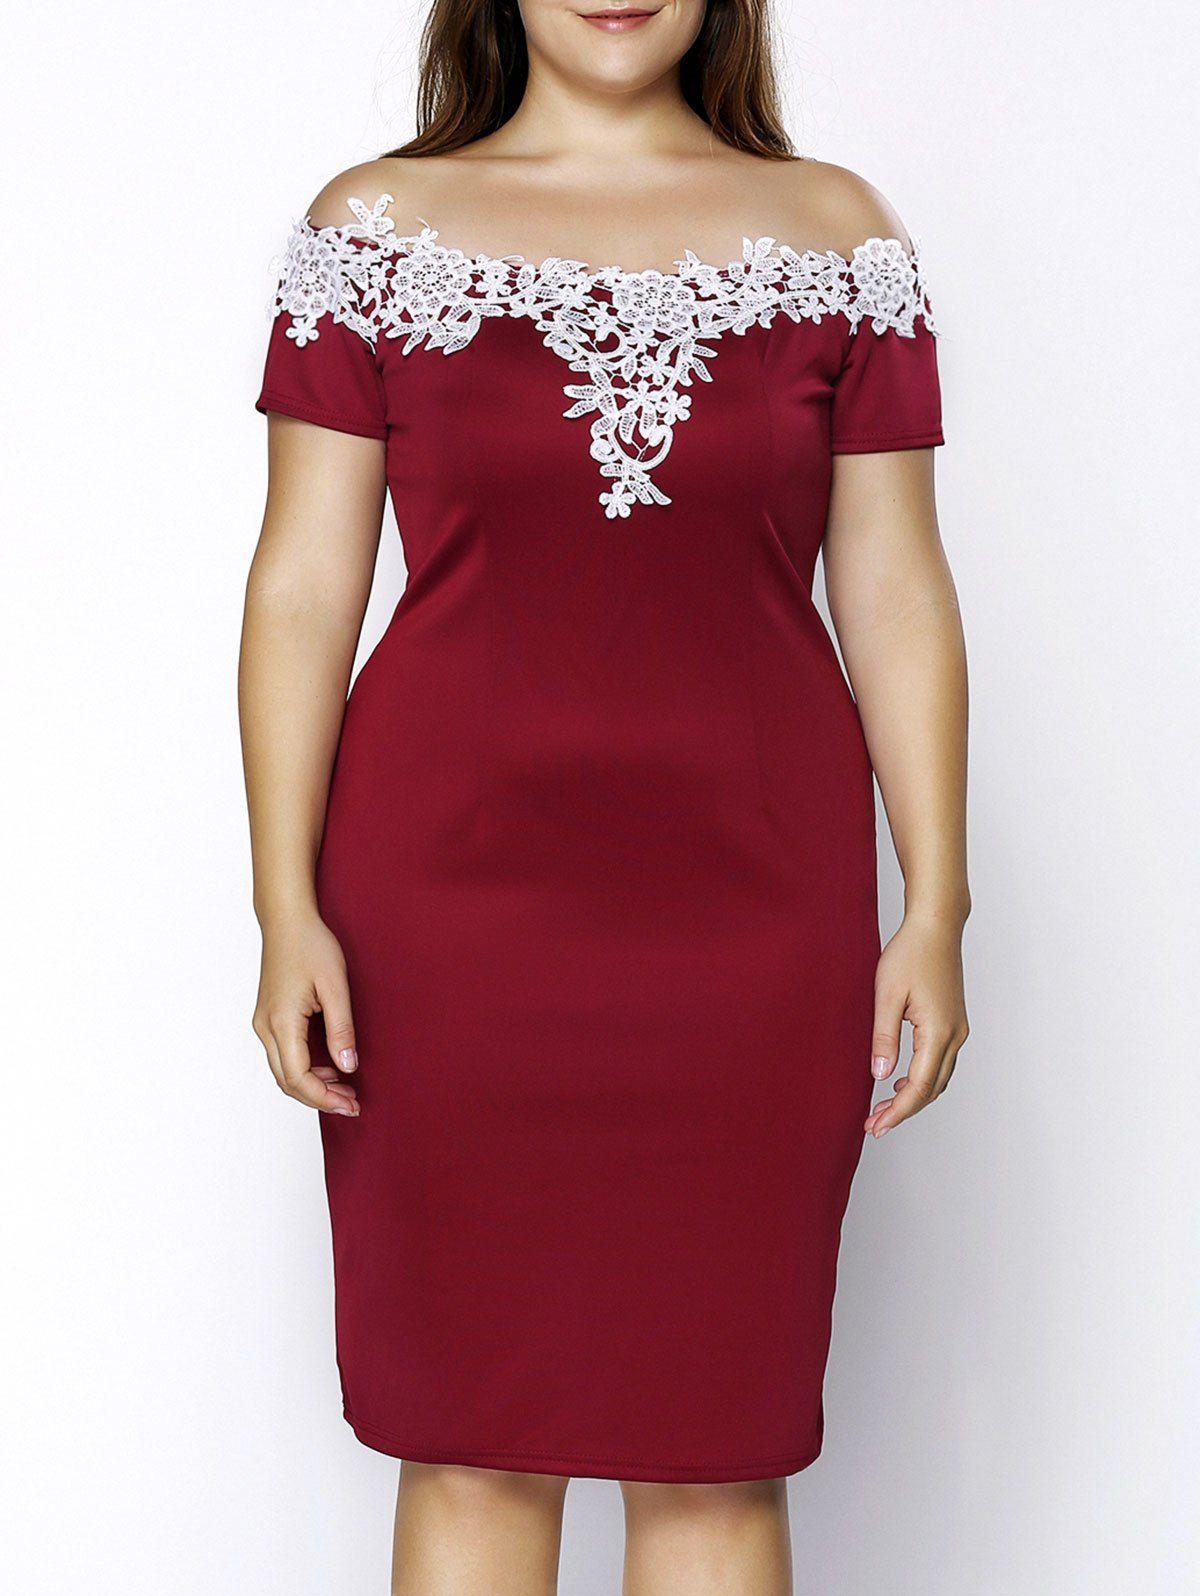 Trendy Plus Size Crochet Off The Shoulder Short Sleeve Dress For